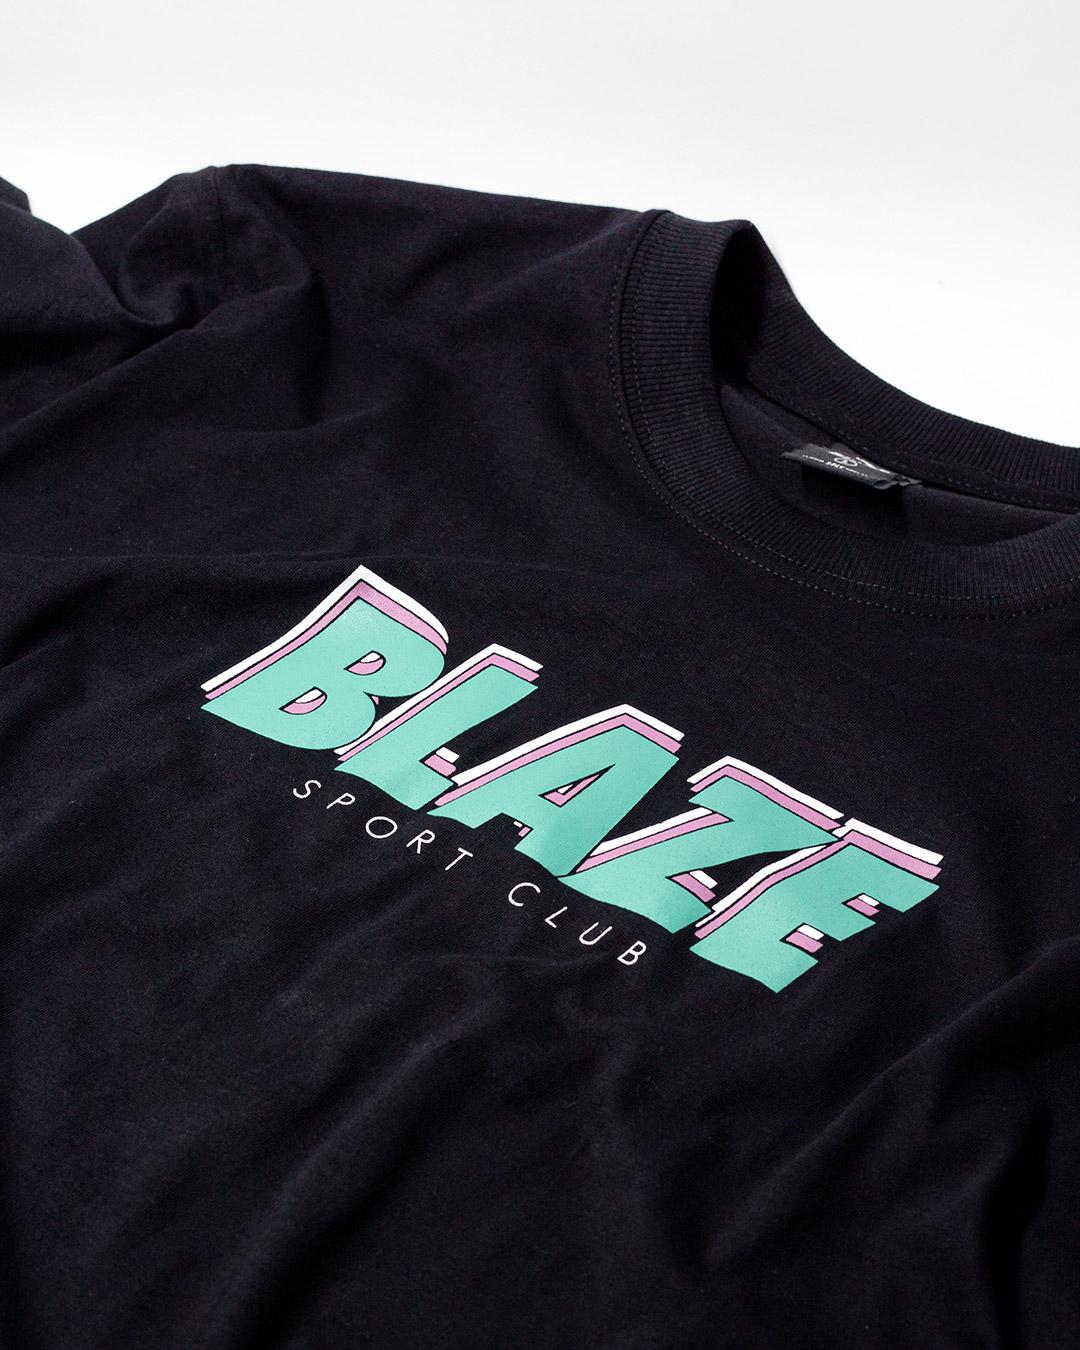 Camiseta Sport Club Black Blaze Supply